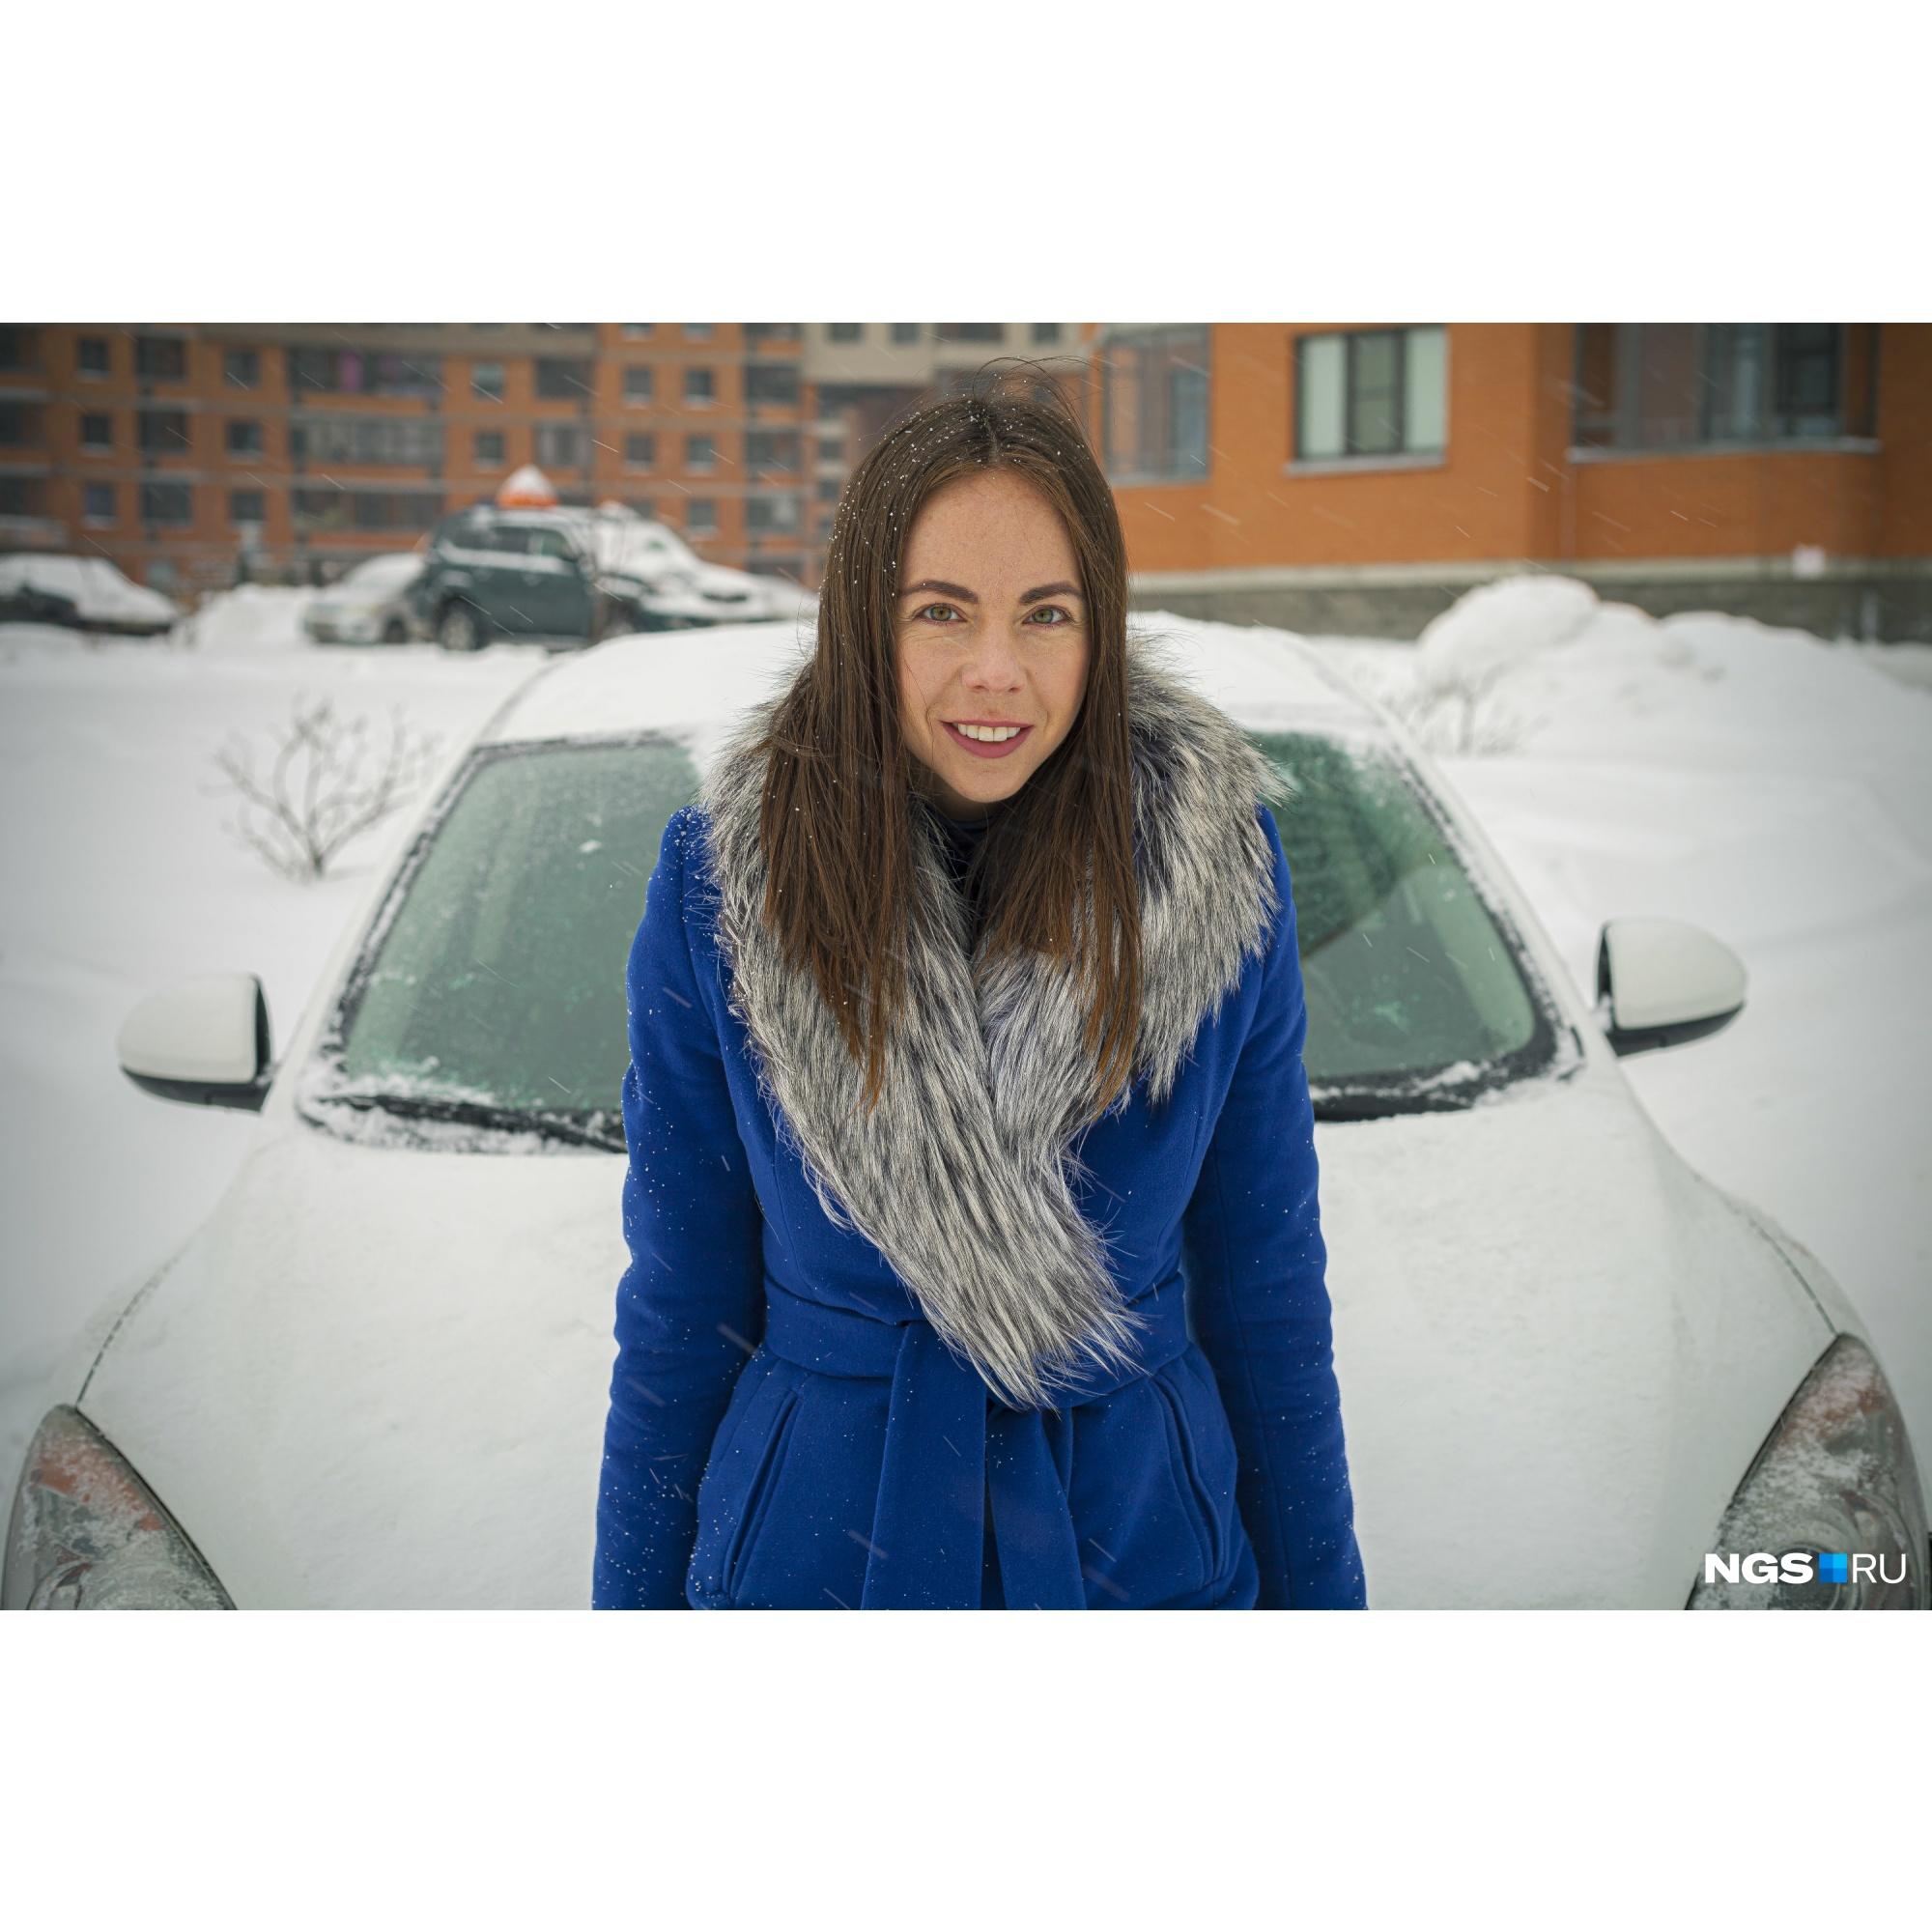 Катеринадолго мечтала о машине